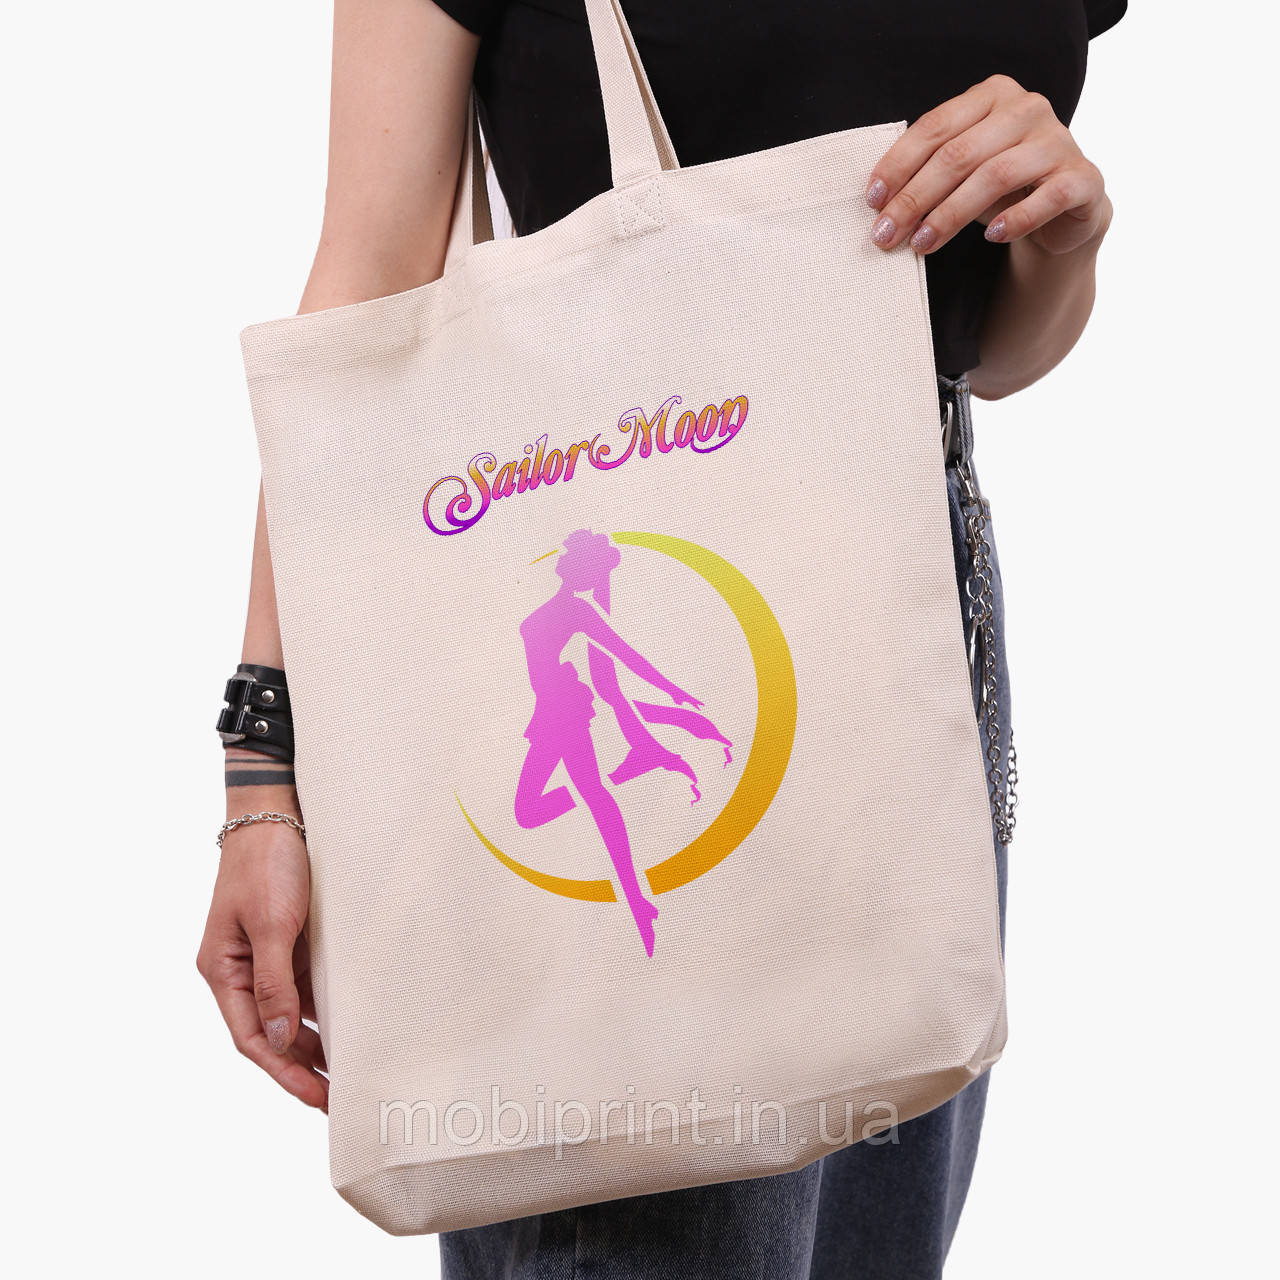 Еко сумка шоппер біла Сейлор Мун (Sailor Moon) (9227-2658-1) 41*39*8 см